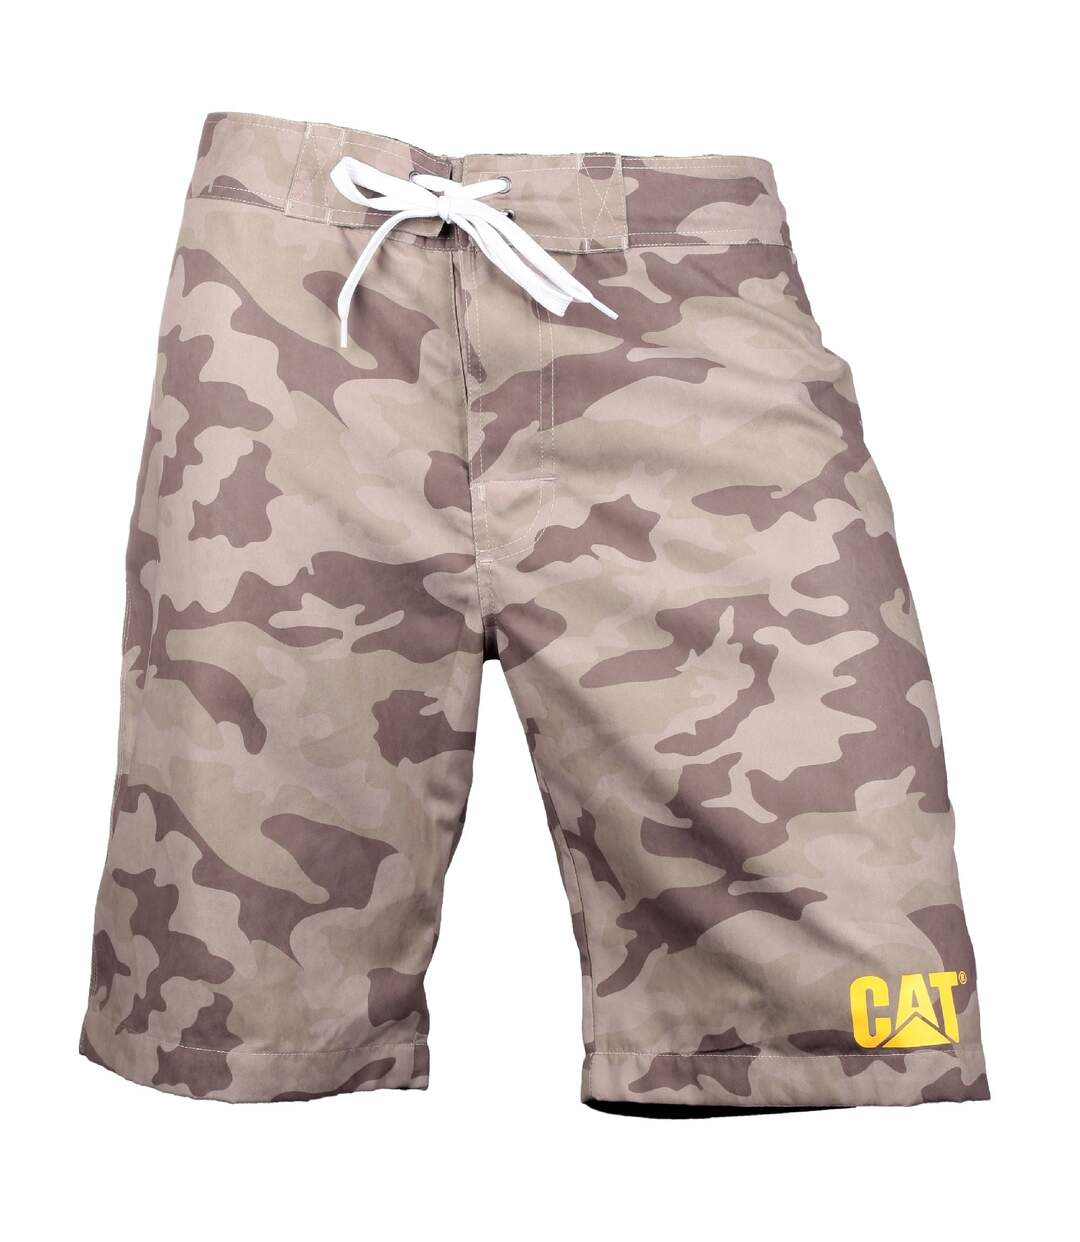 CAT Lifestyle Mens C2820967 Logo Drawstring Board Shorts (Camouflage) - UTFS3758